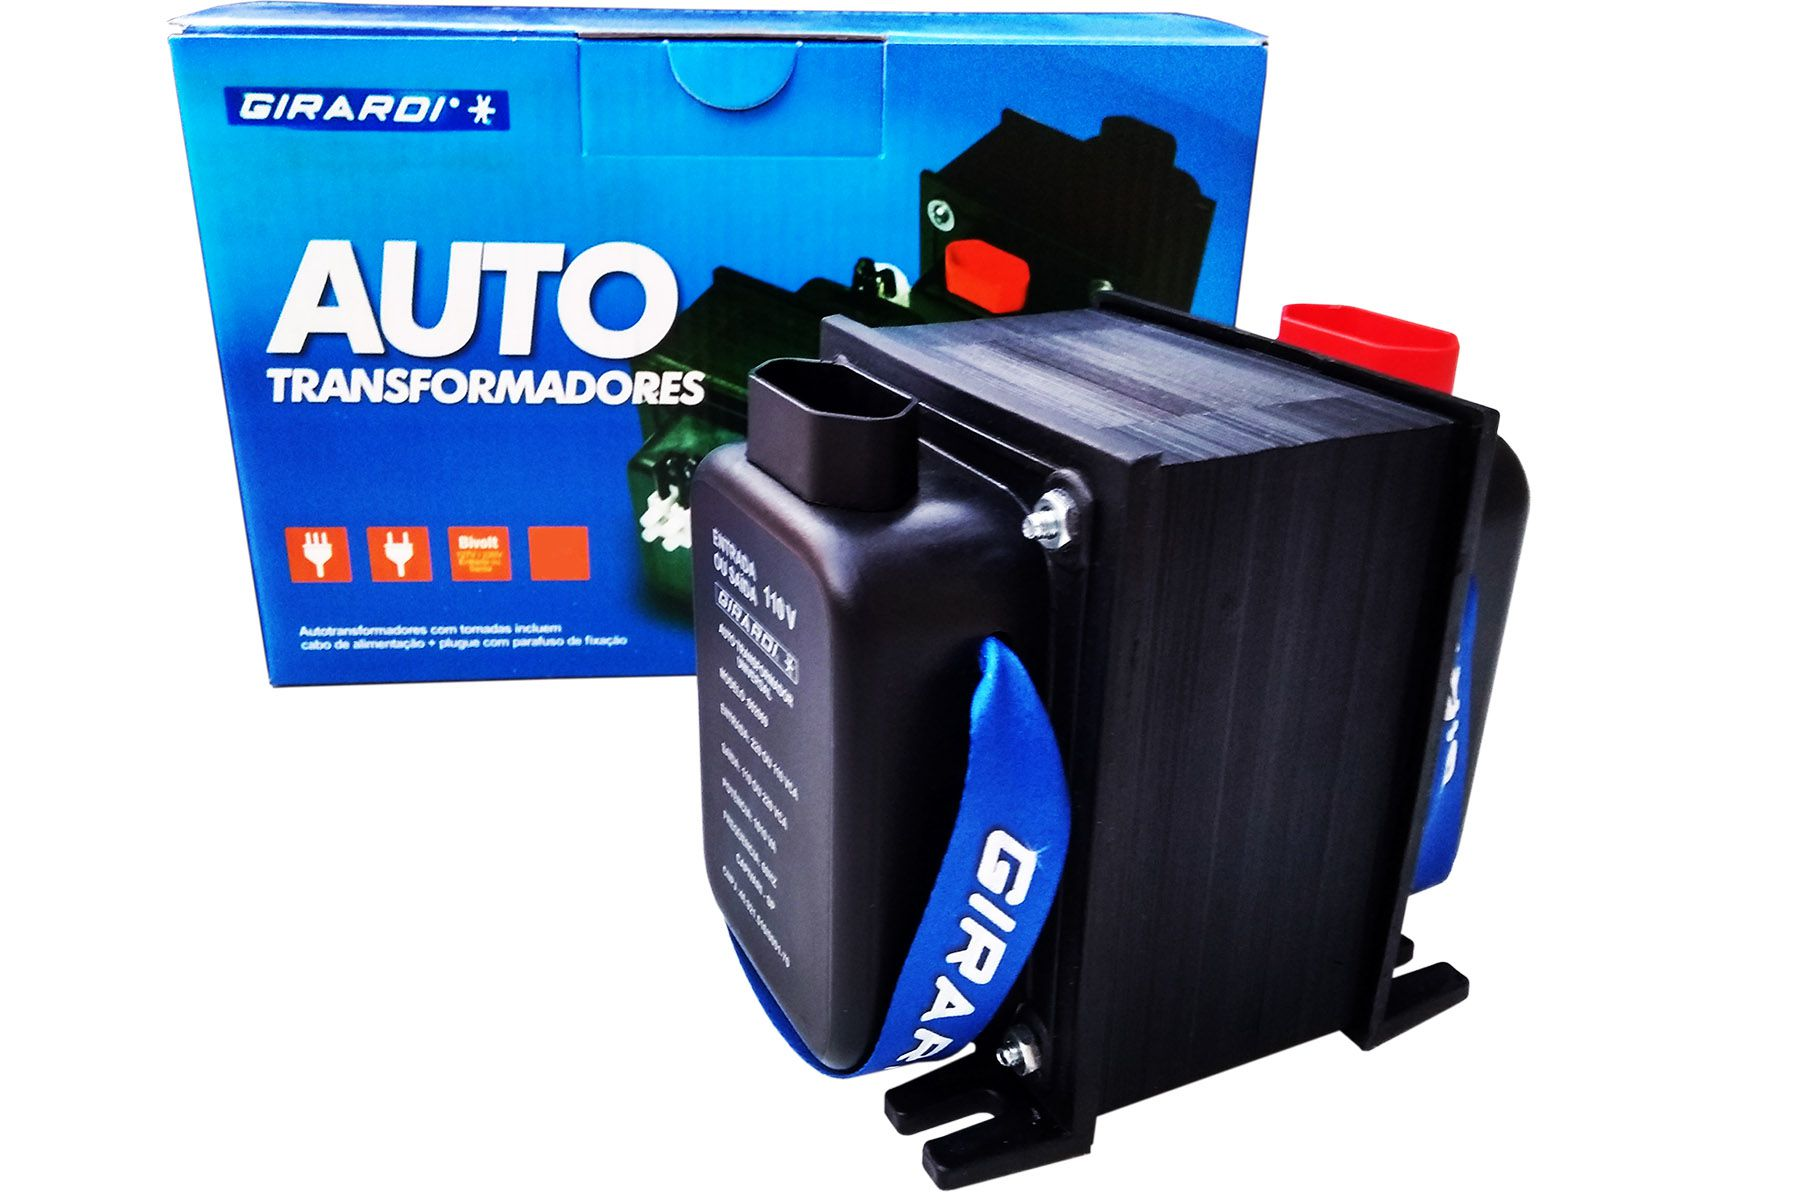 Auto Transformador Conversor Bivolt 110 / 127 e 220 V GIRARDI Profissional 2000 VA / 1400 W